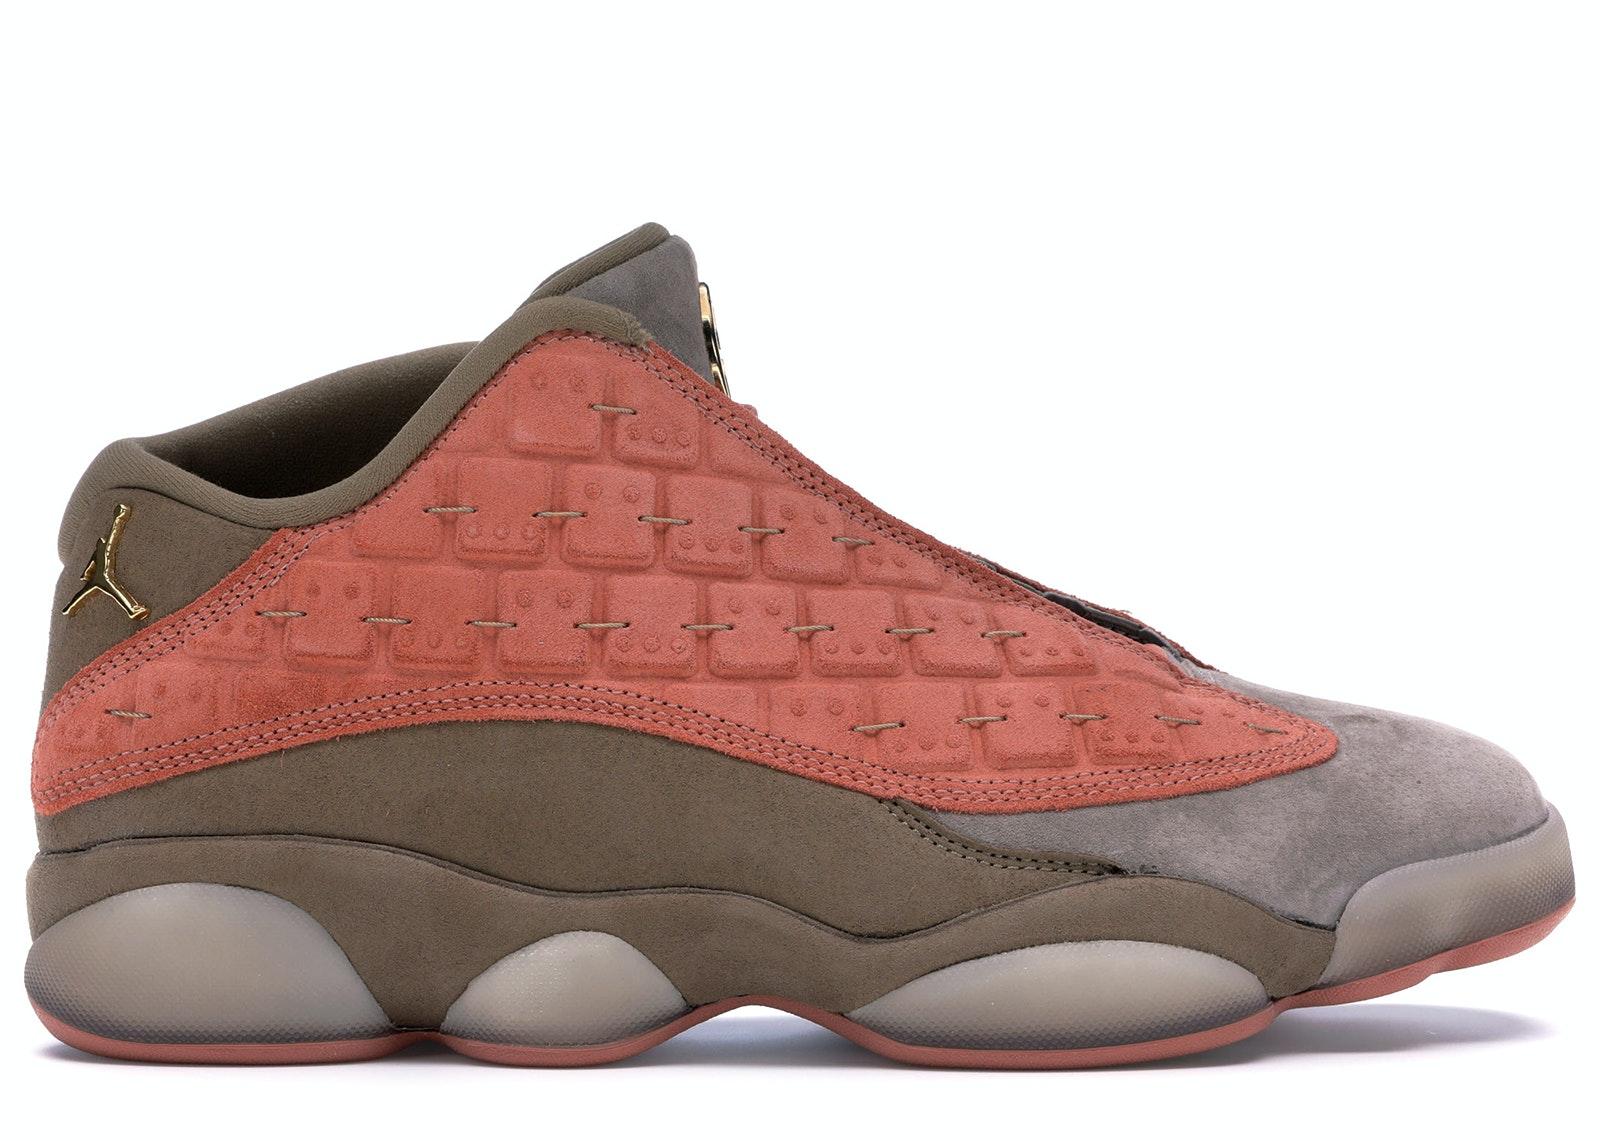 Jordan 13 Retro Low Clot Sepia Stone